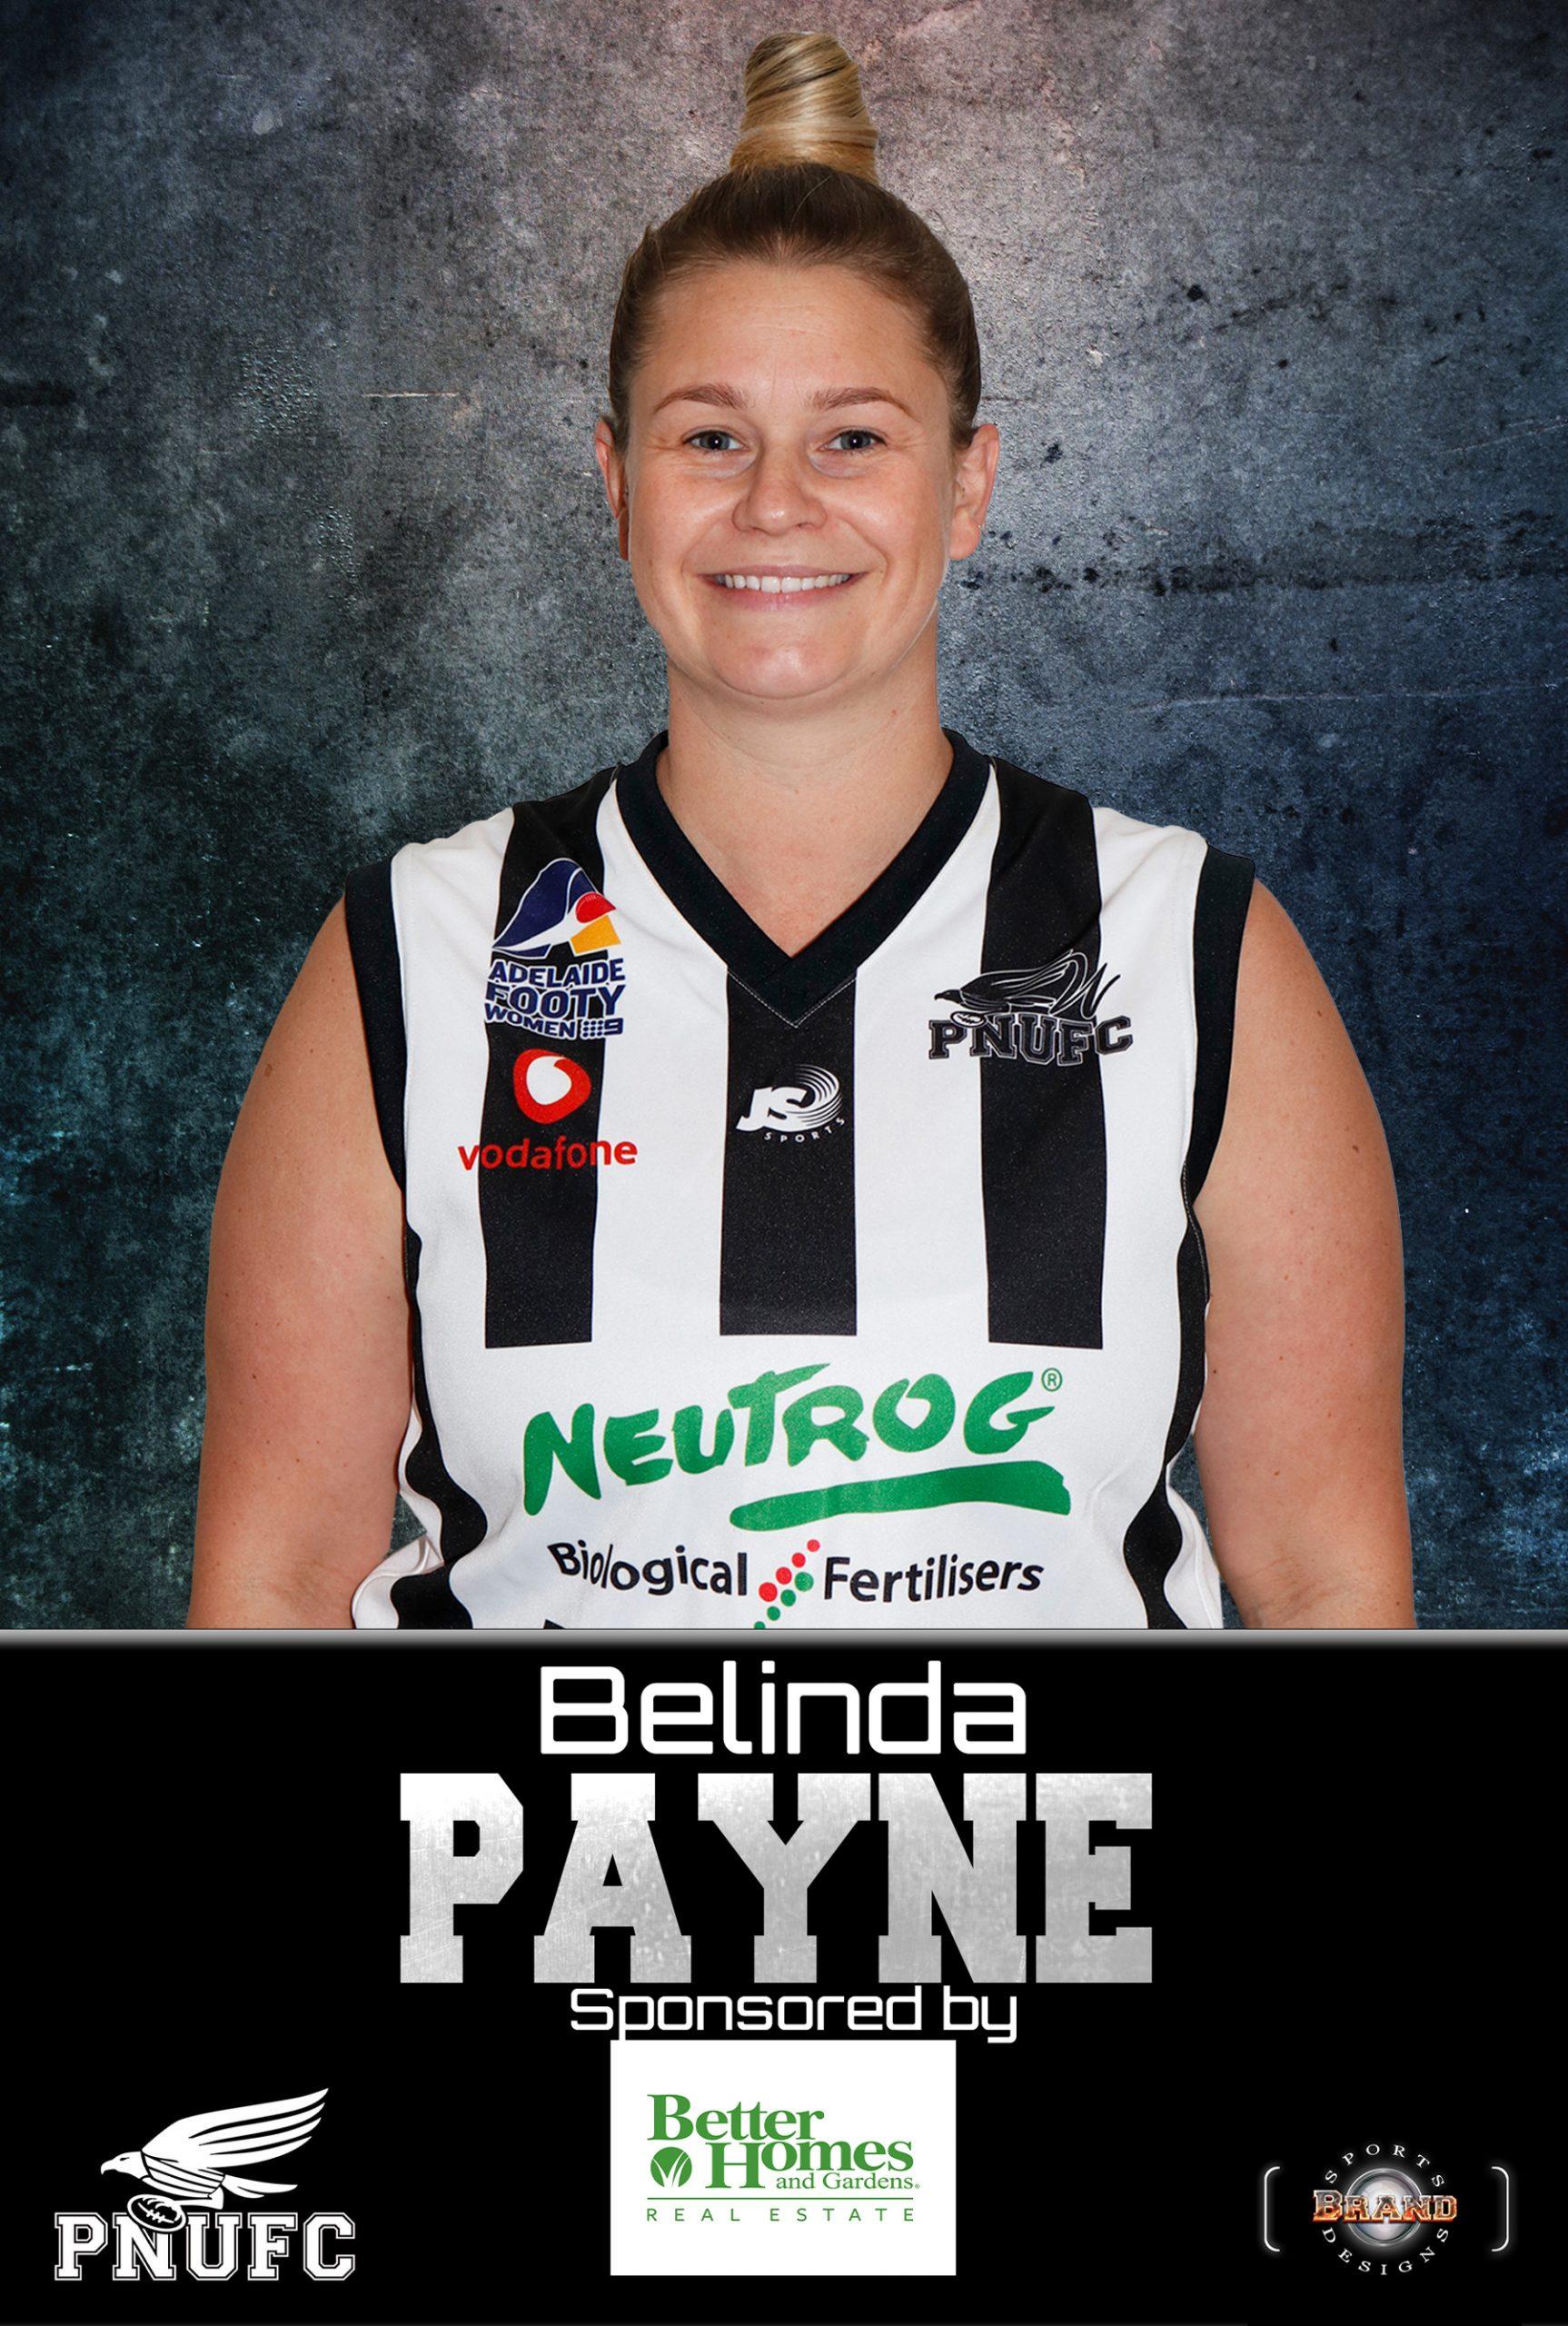 Belinda Payne